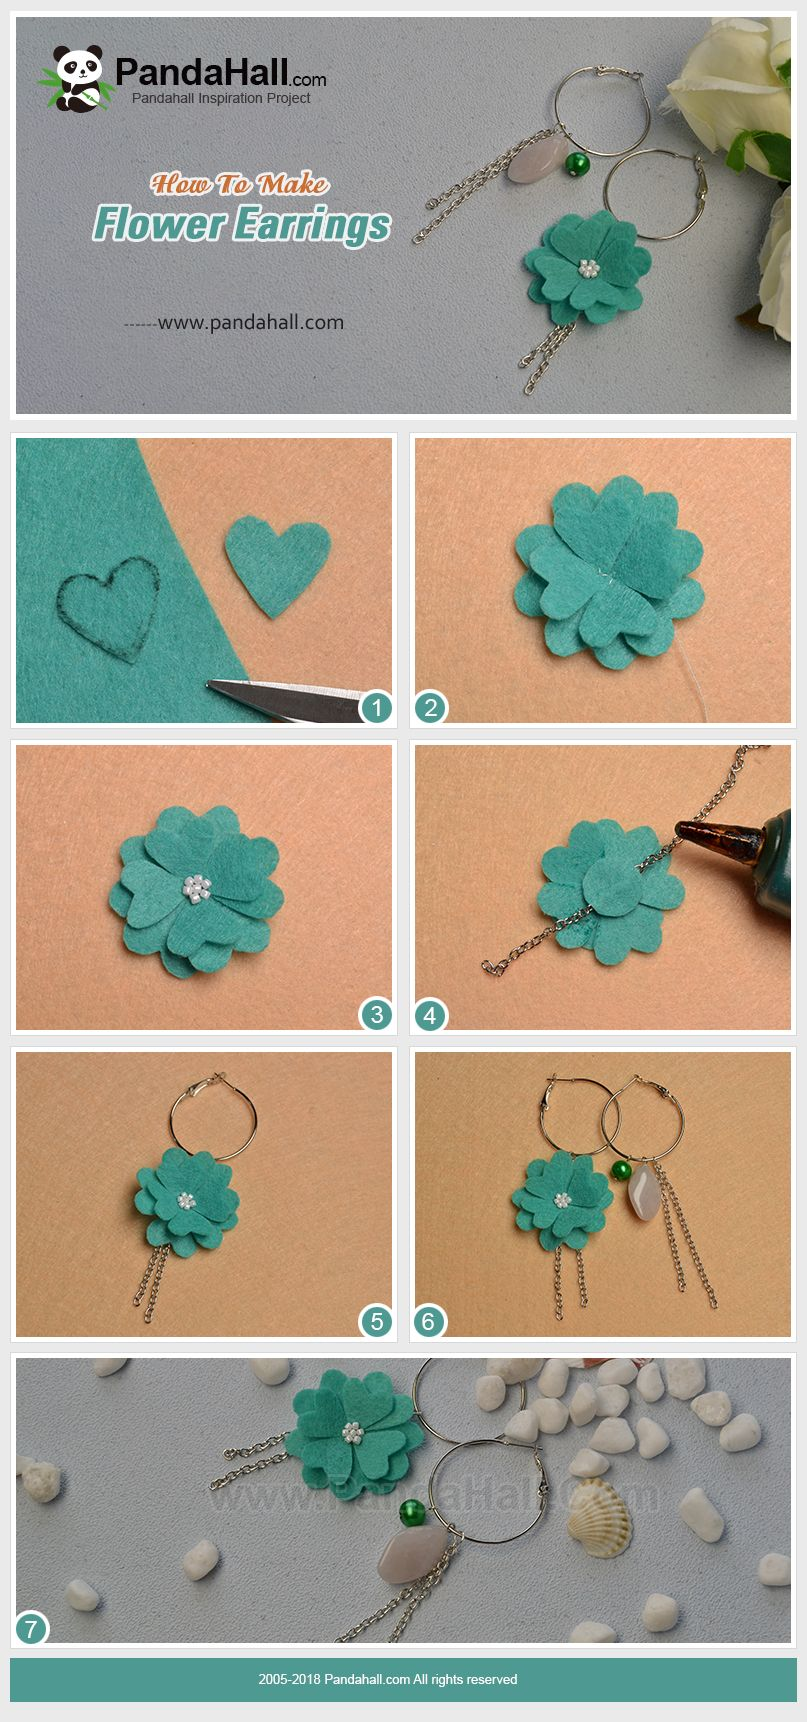 Beebeecraft Tutorials On Making Flower Earrings Aretes